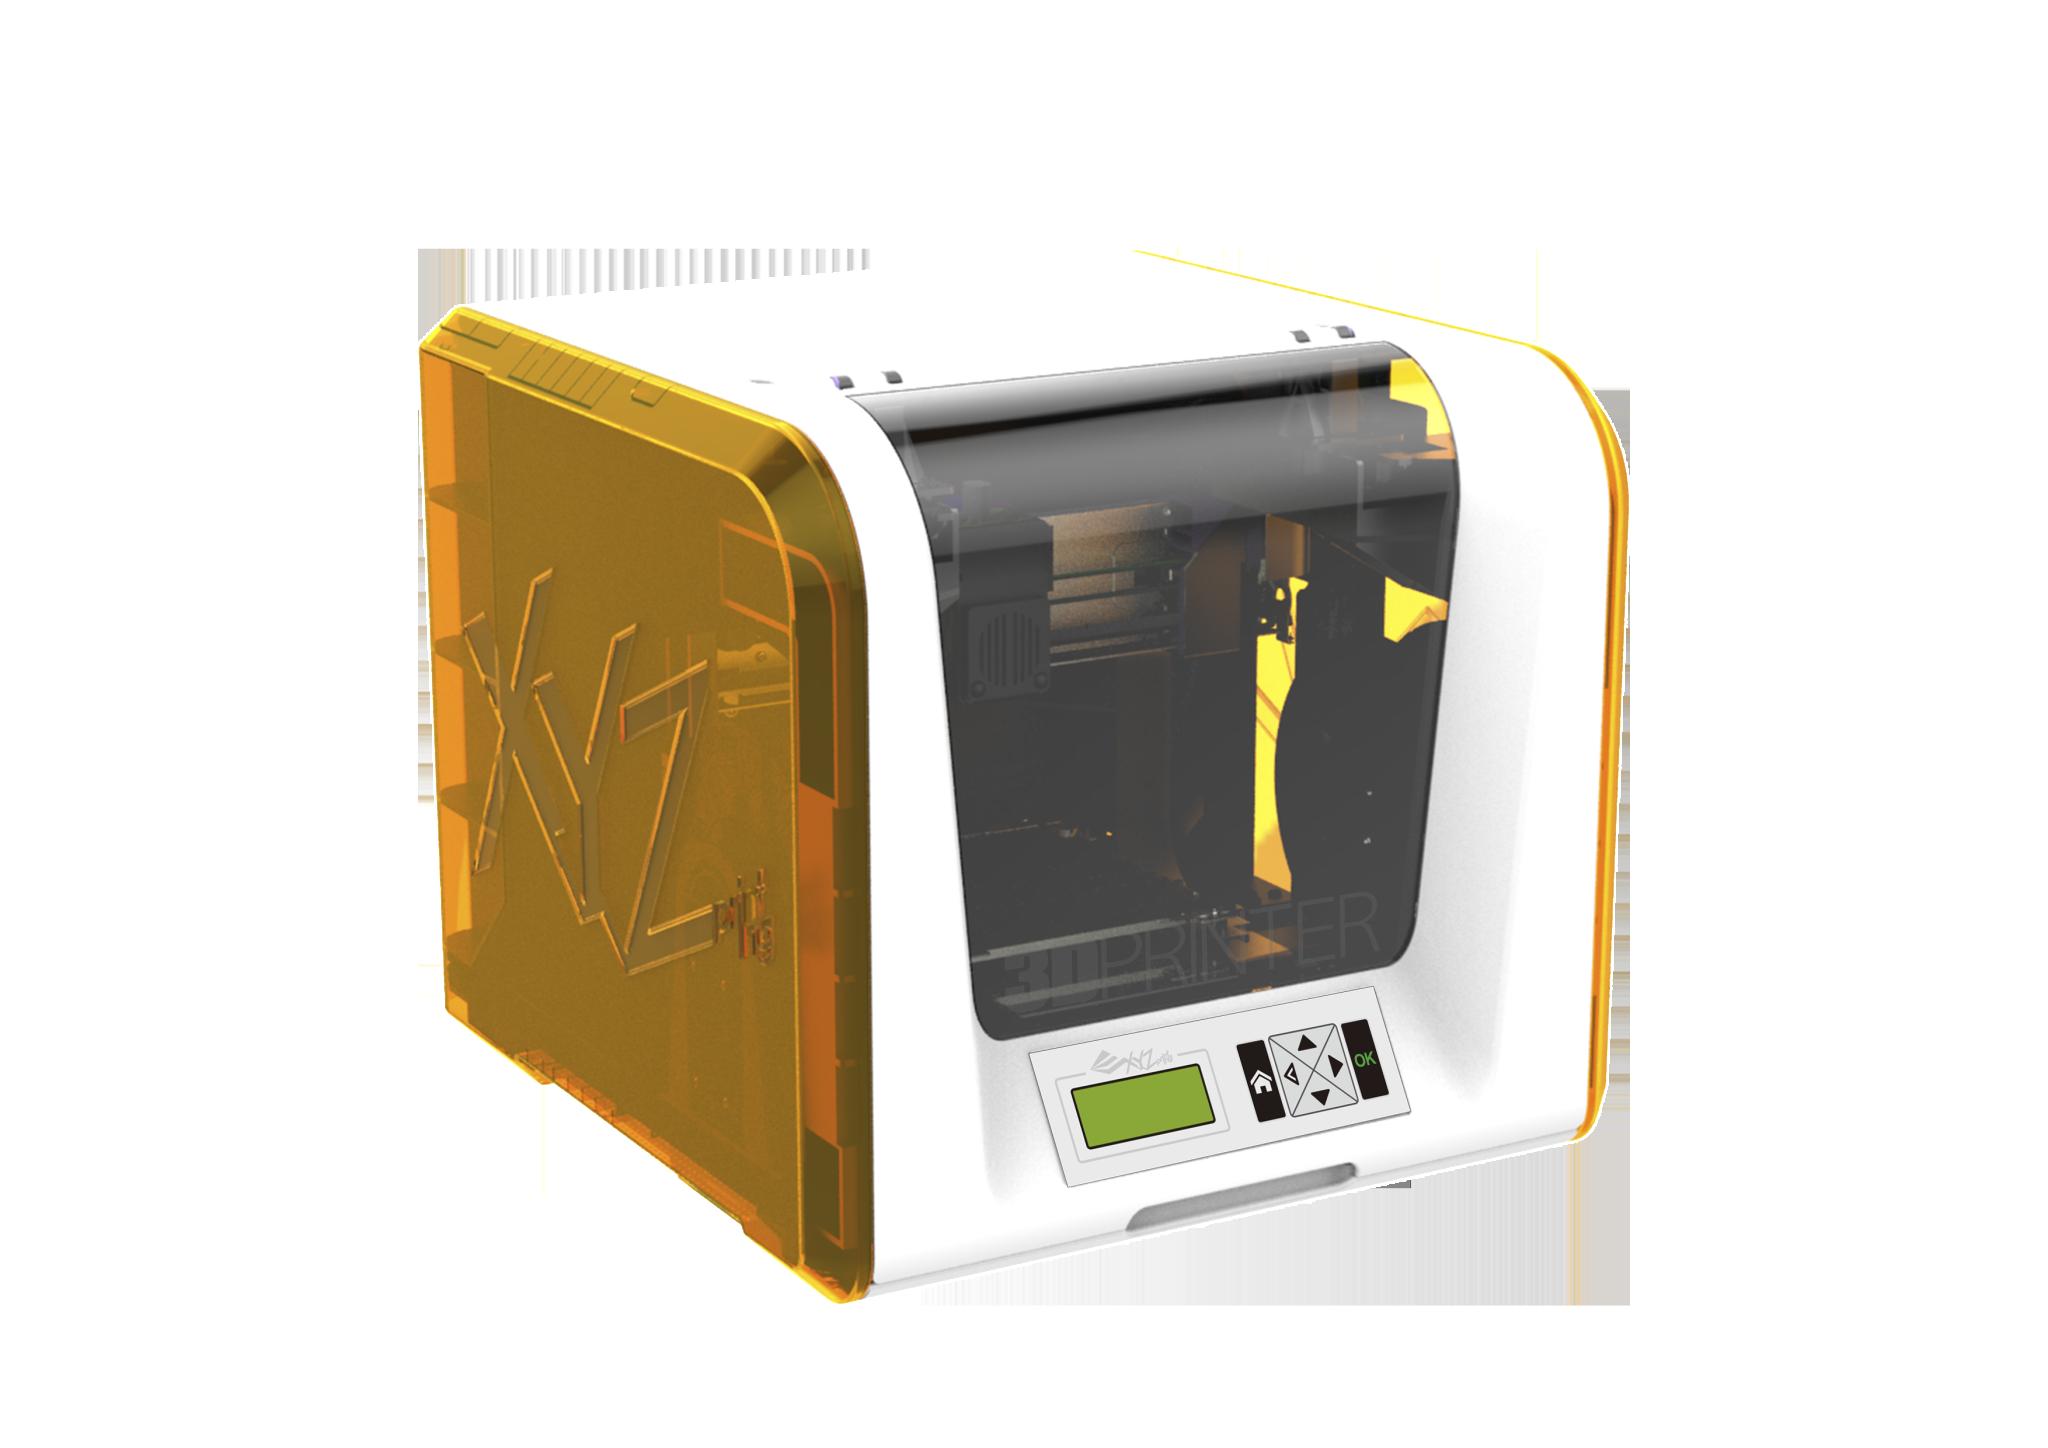 xyzprinting unveils 349 da vinci junior fff 1499 nobel 1 0 sla 3d printers at 2015 ces. Black Bedroom Furniture Sets. Home Design Ideas